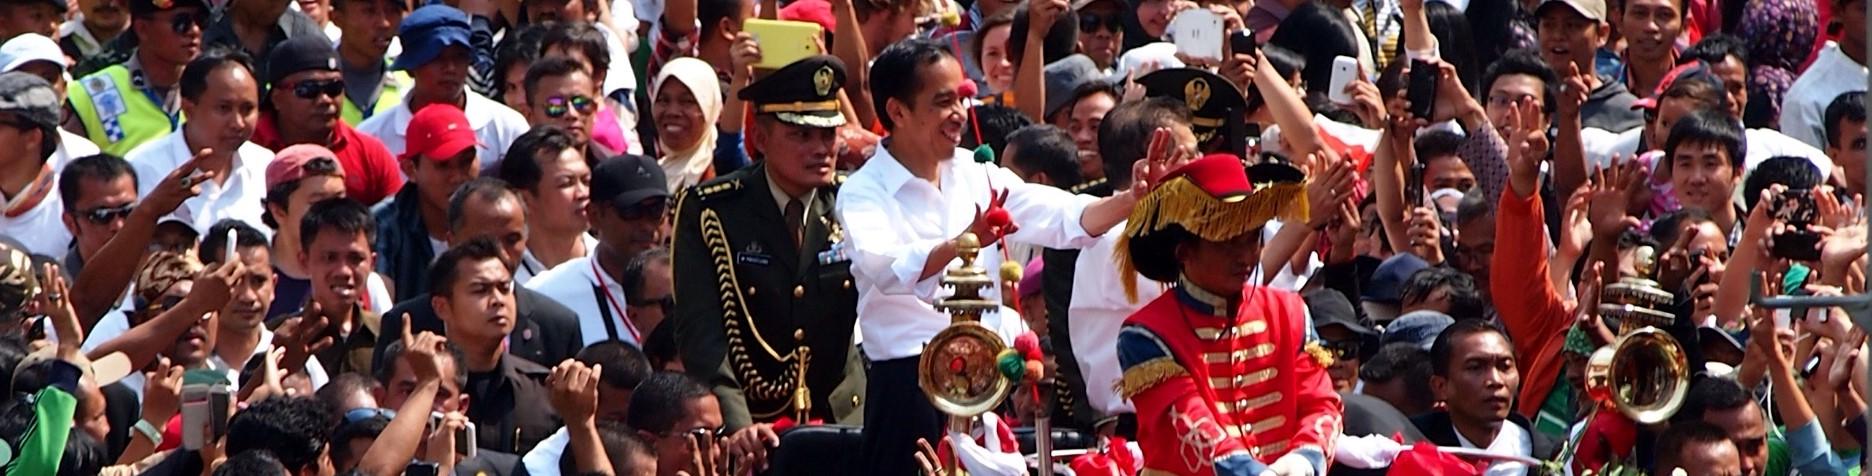 The Jokowi inaugration, 20 October 2014, Jakarta (Photo: Flickr/Kreshna Aditya)